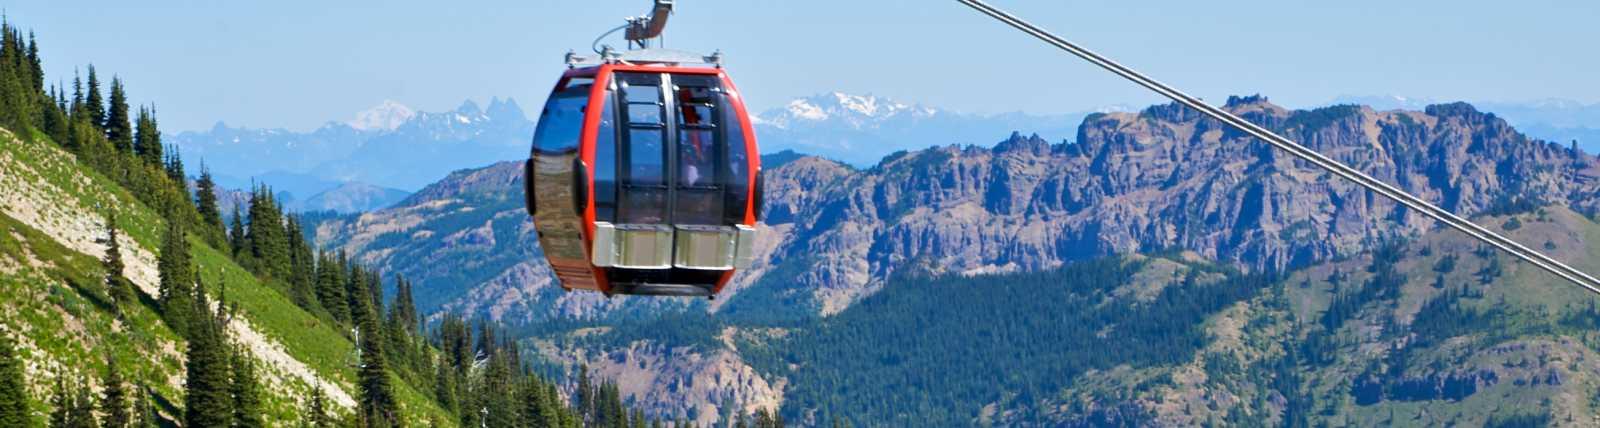 The Mt. Rainier Gondola